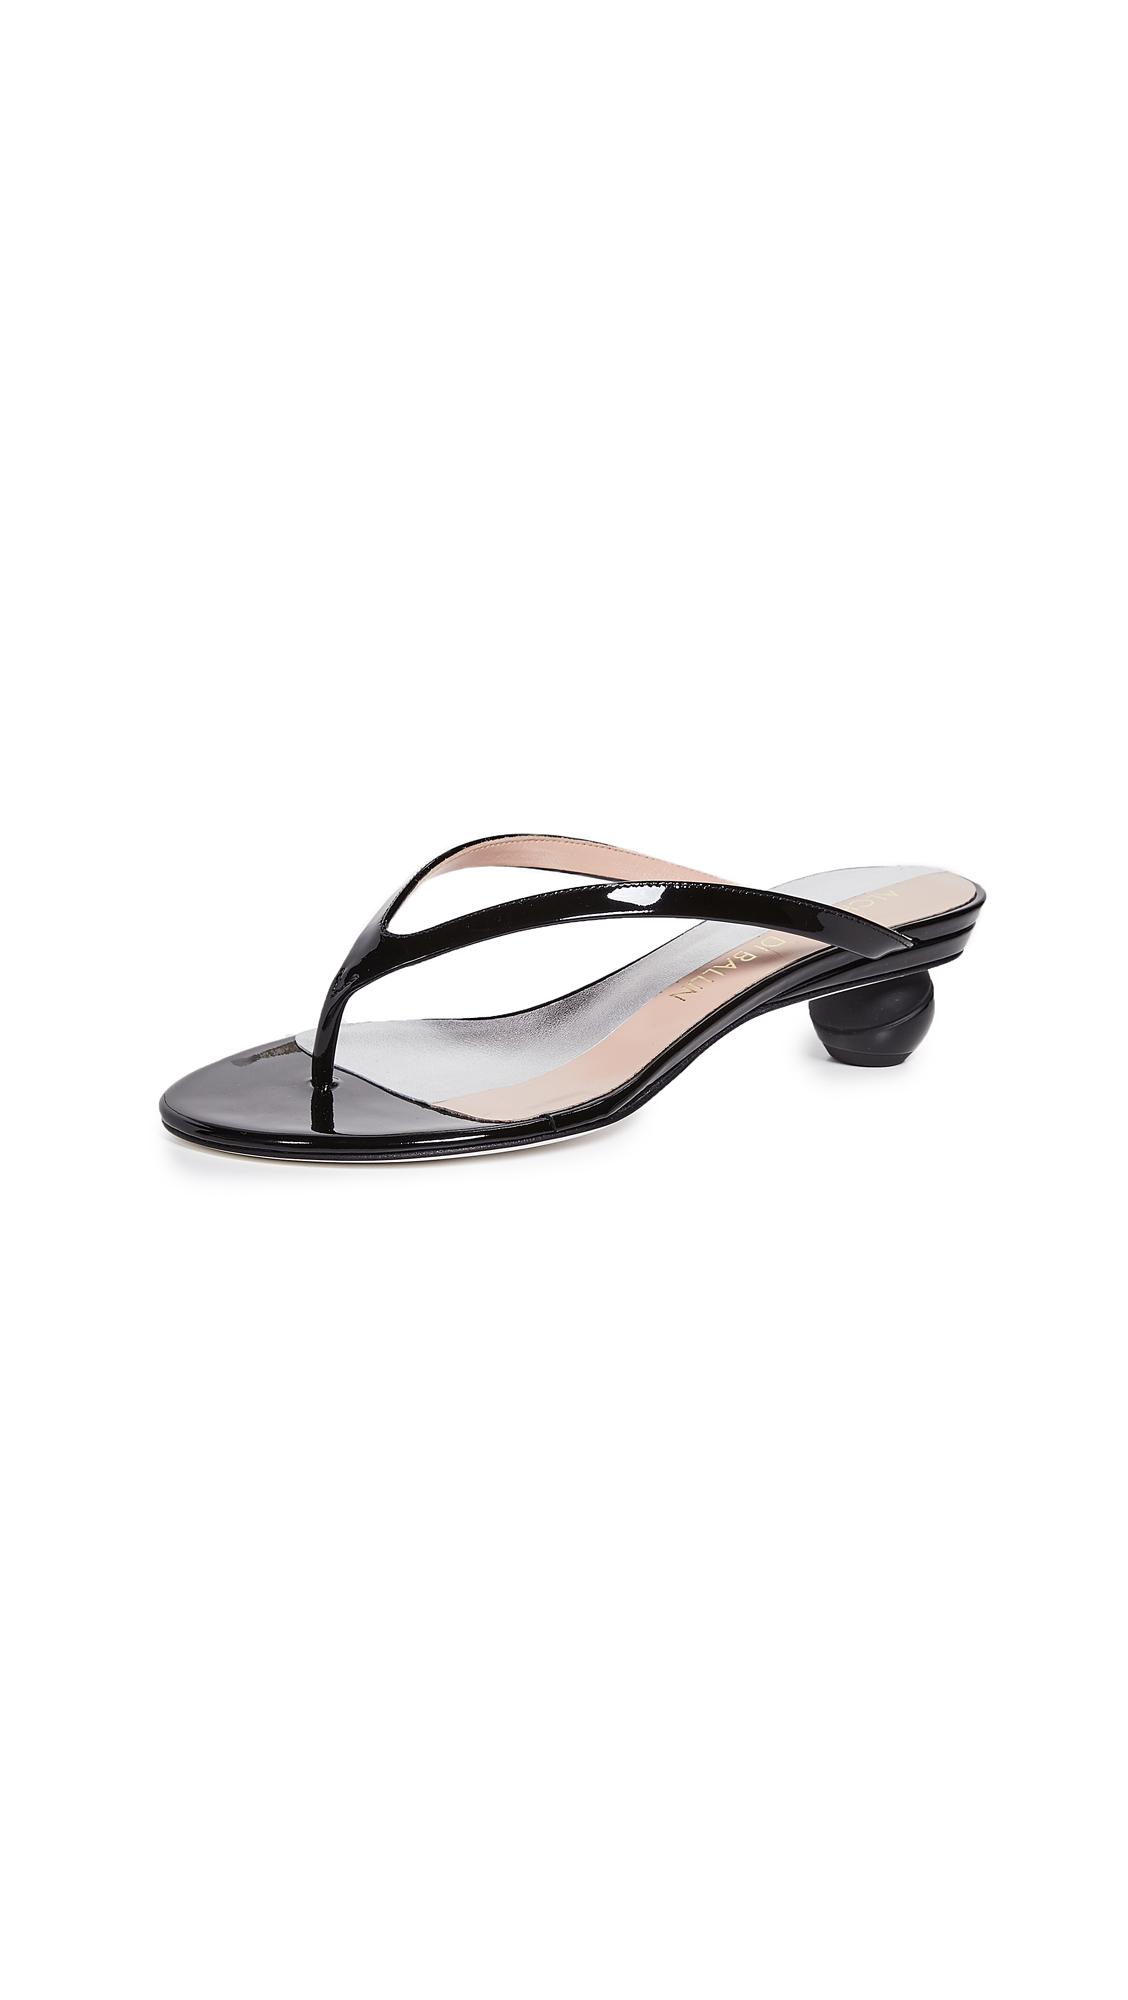 Alchimia di Ballin Vernice Thong Sandals - Black